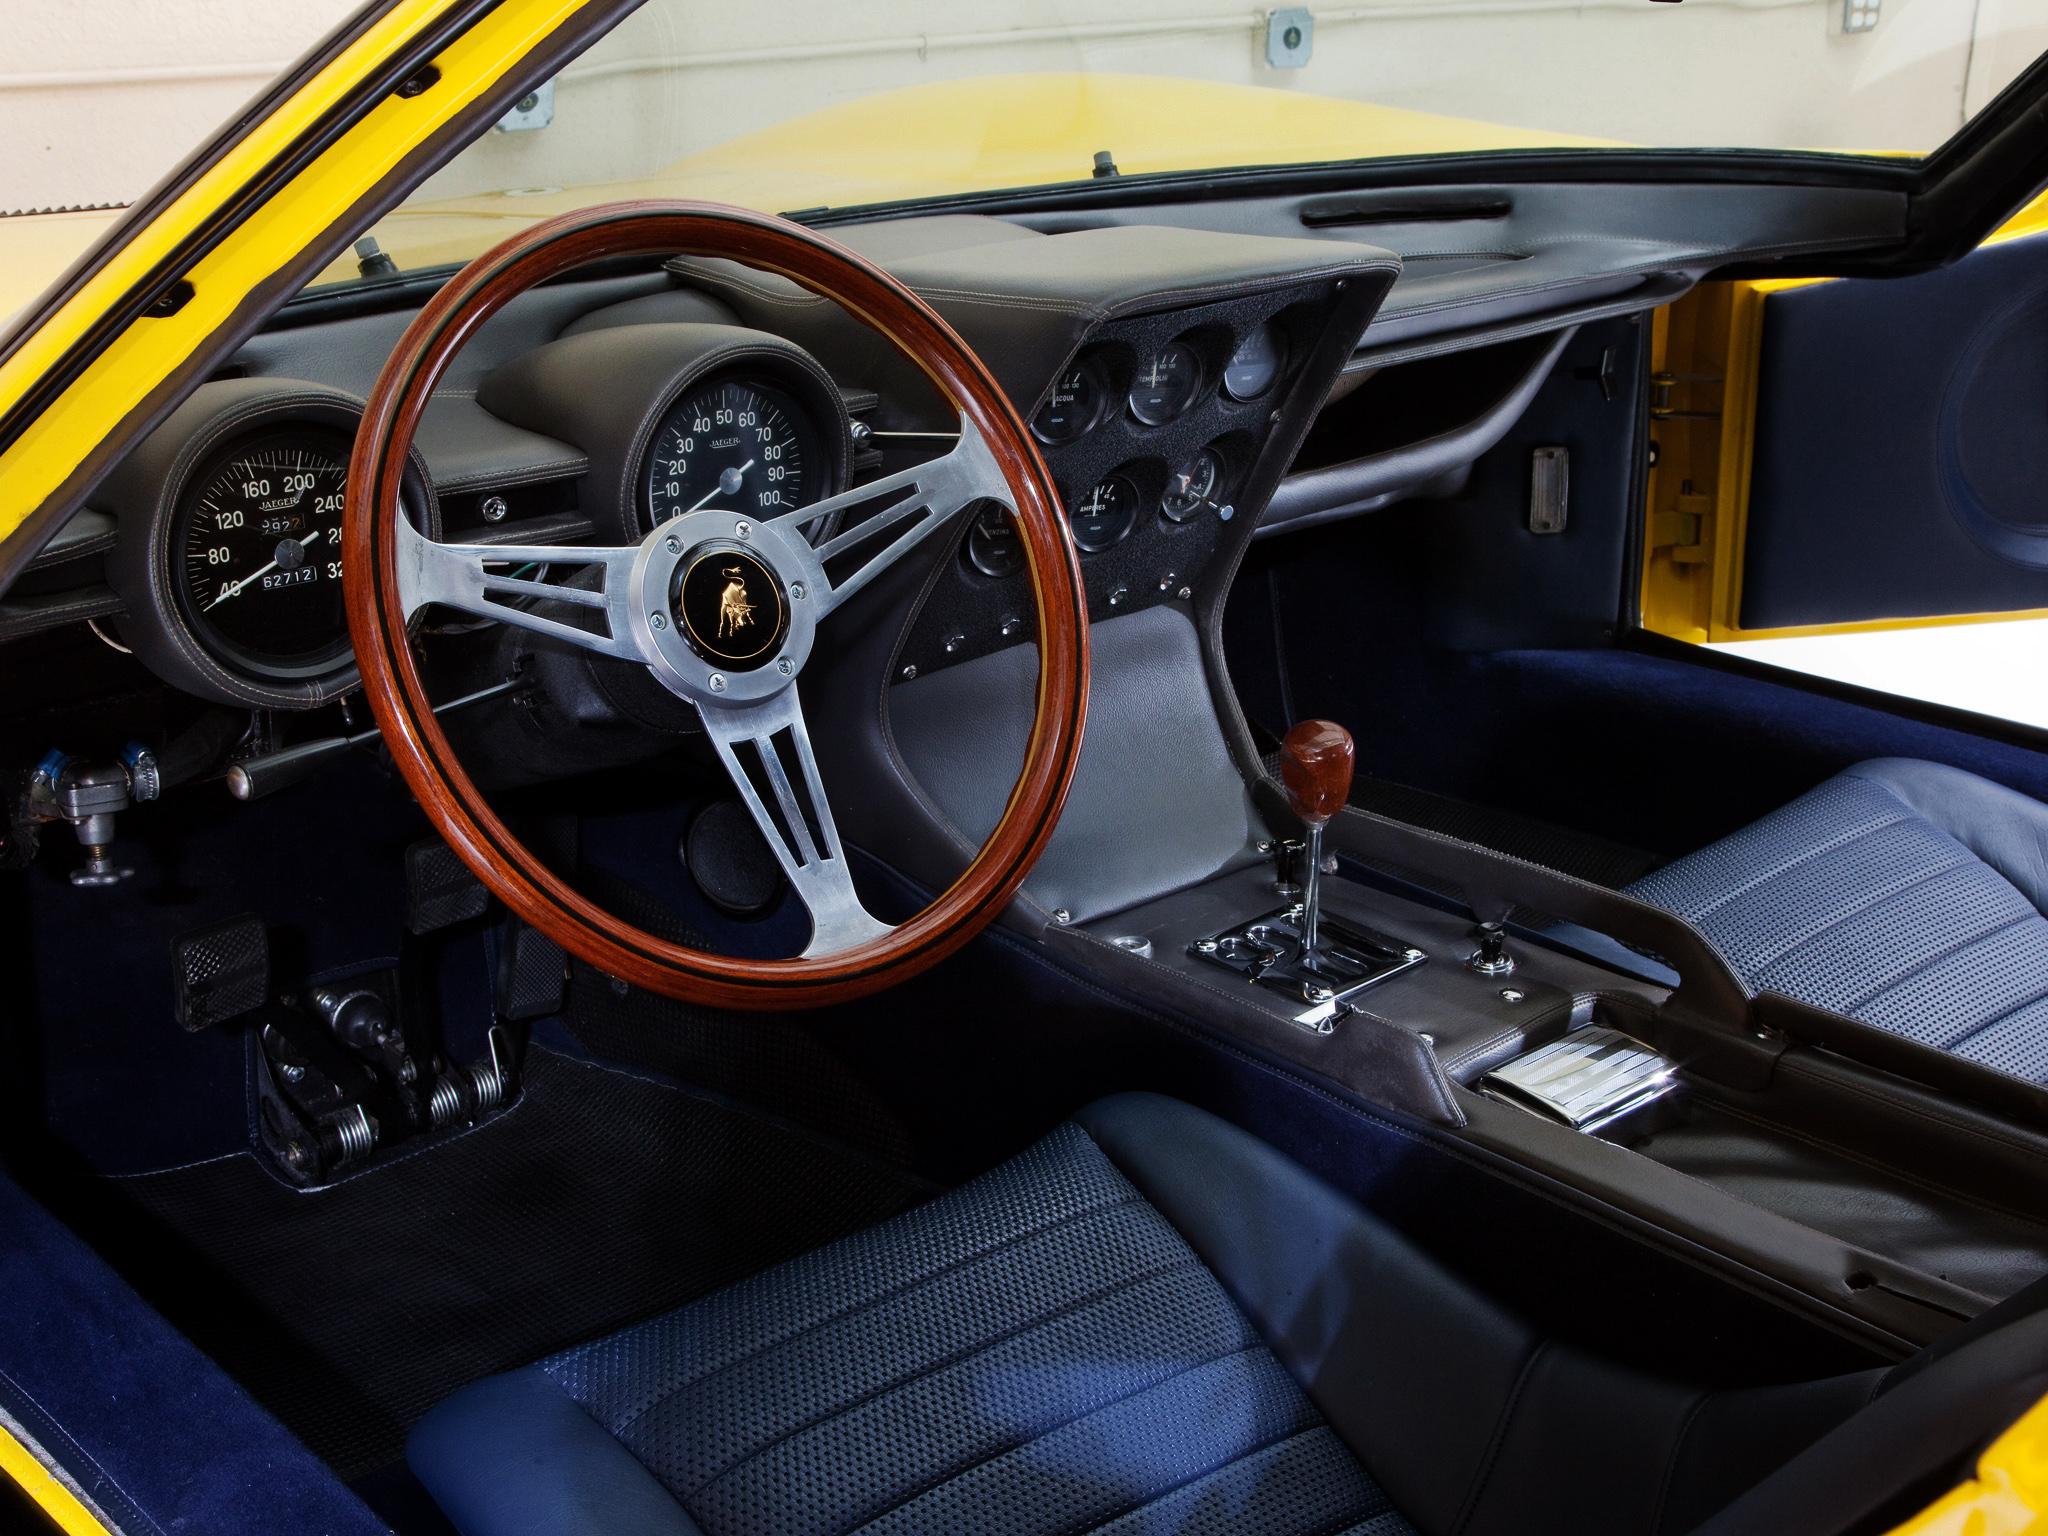 1966 Lamborghini Miura P400 classic supercar supercars g ...